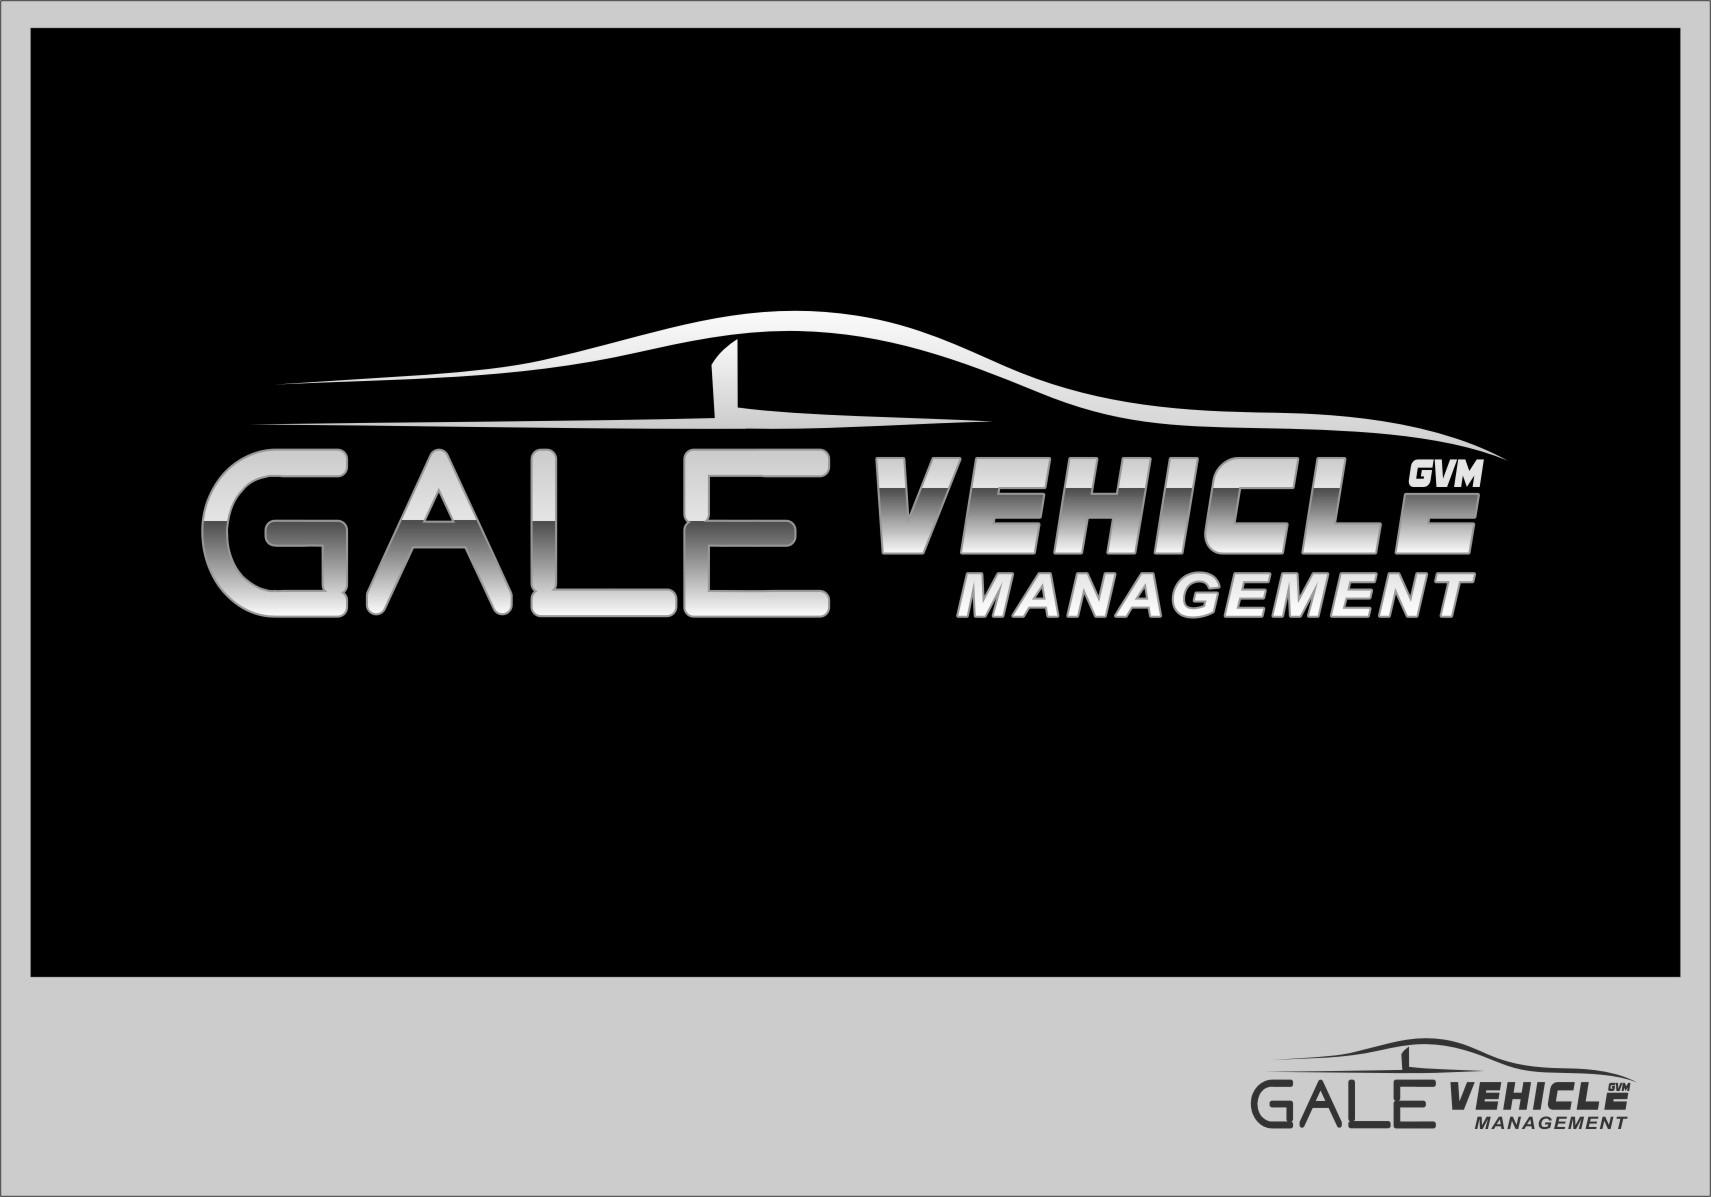 Logo Design by Ngepet_art - Entry No. 148 in the Logo Design Contest Artistic Logo Design for Gale Vehicle Management.